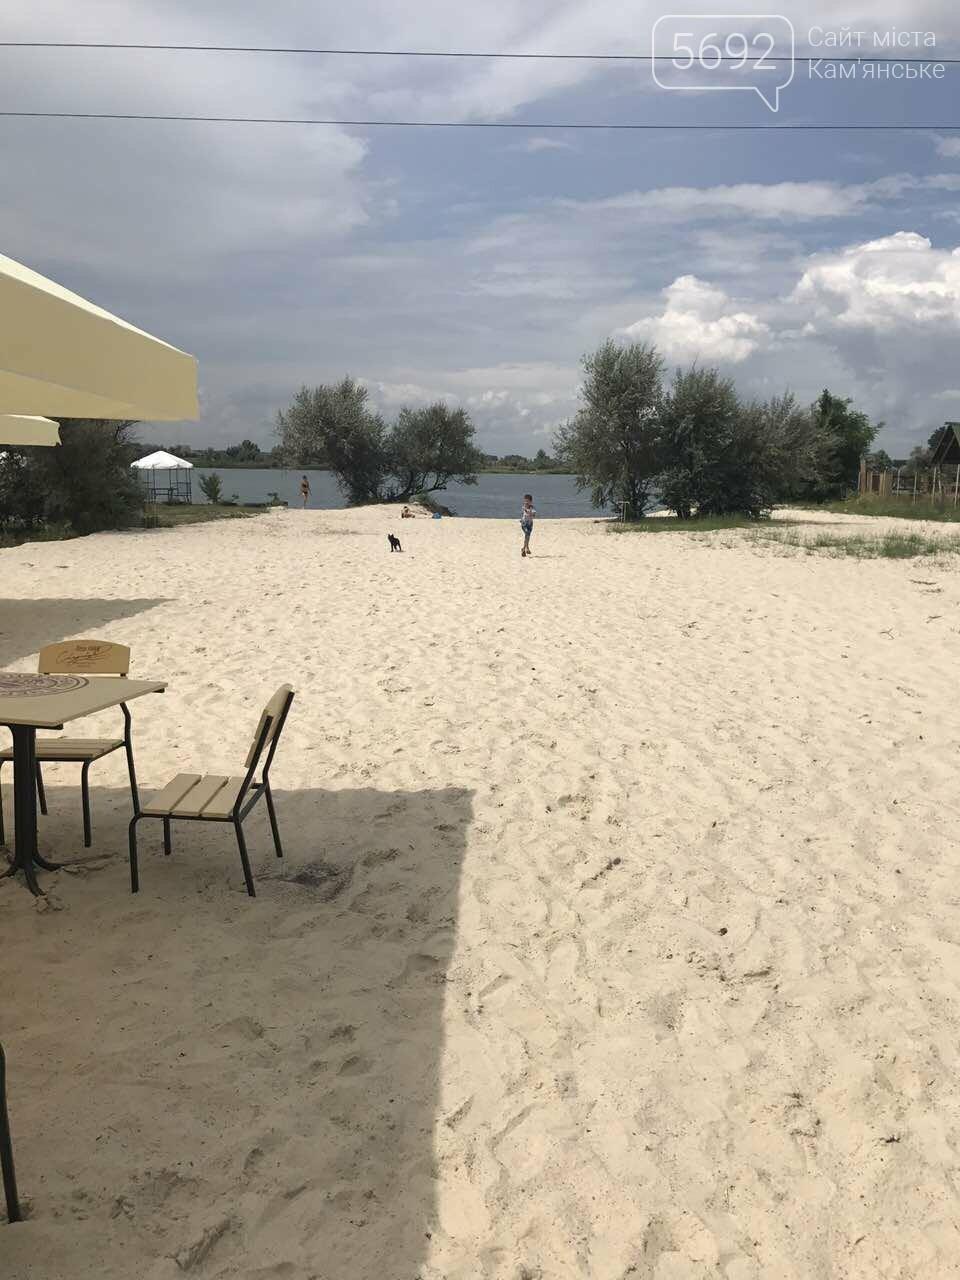 Лето в разгаре: на Голубом озере под Каменским открылся OrangeBeach, фото-6